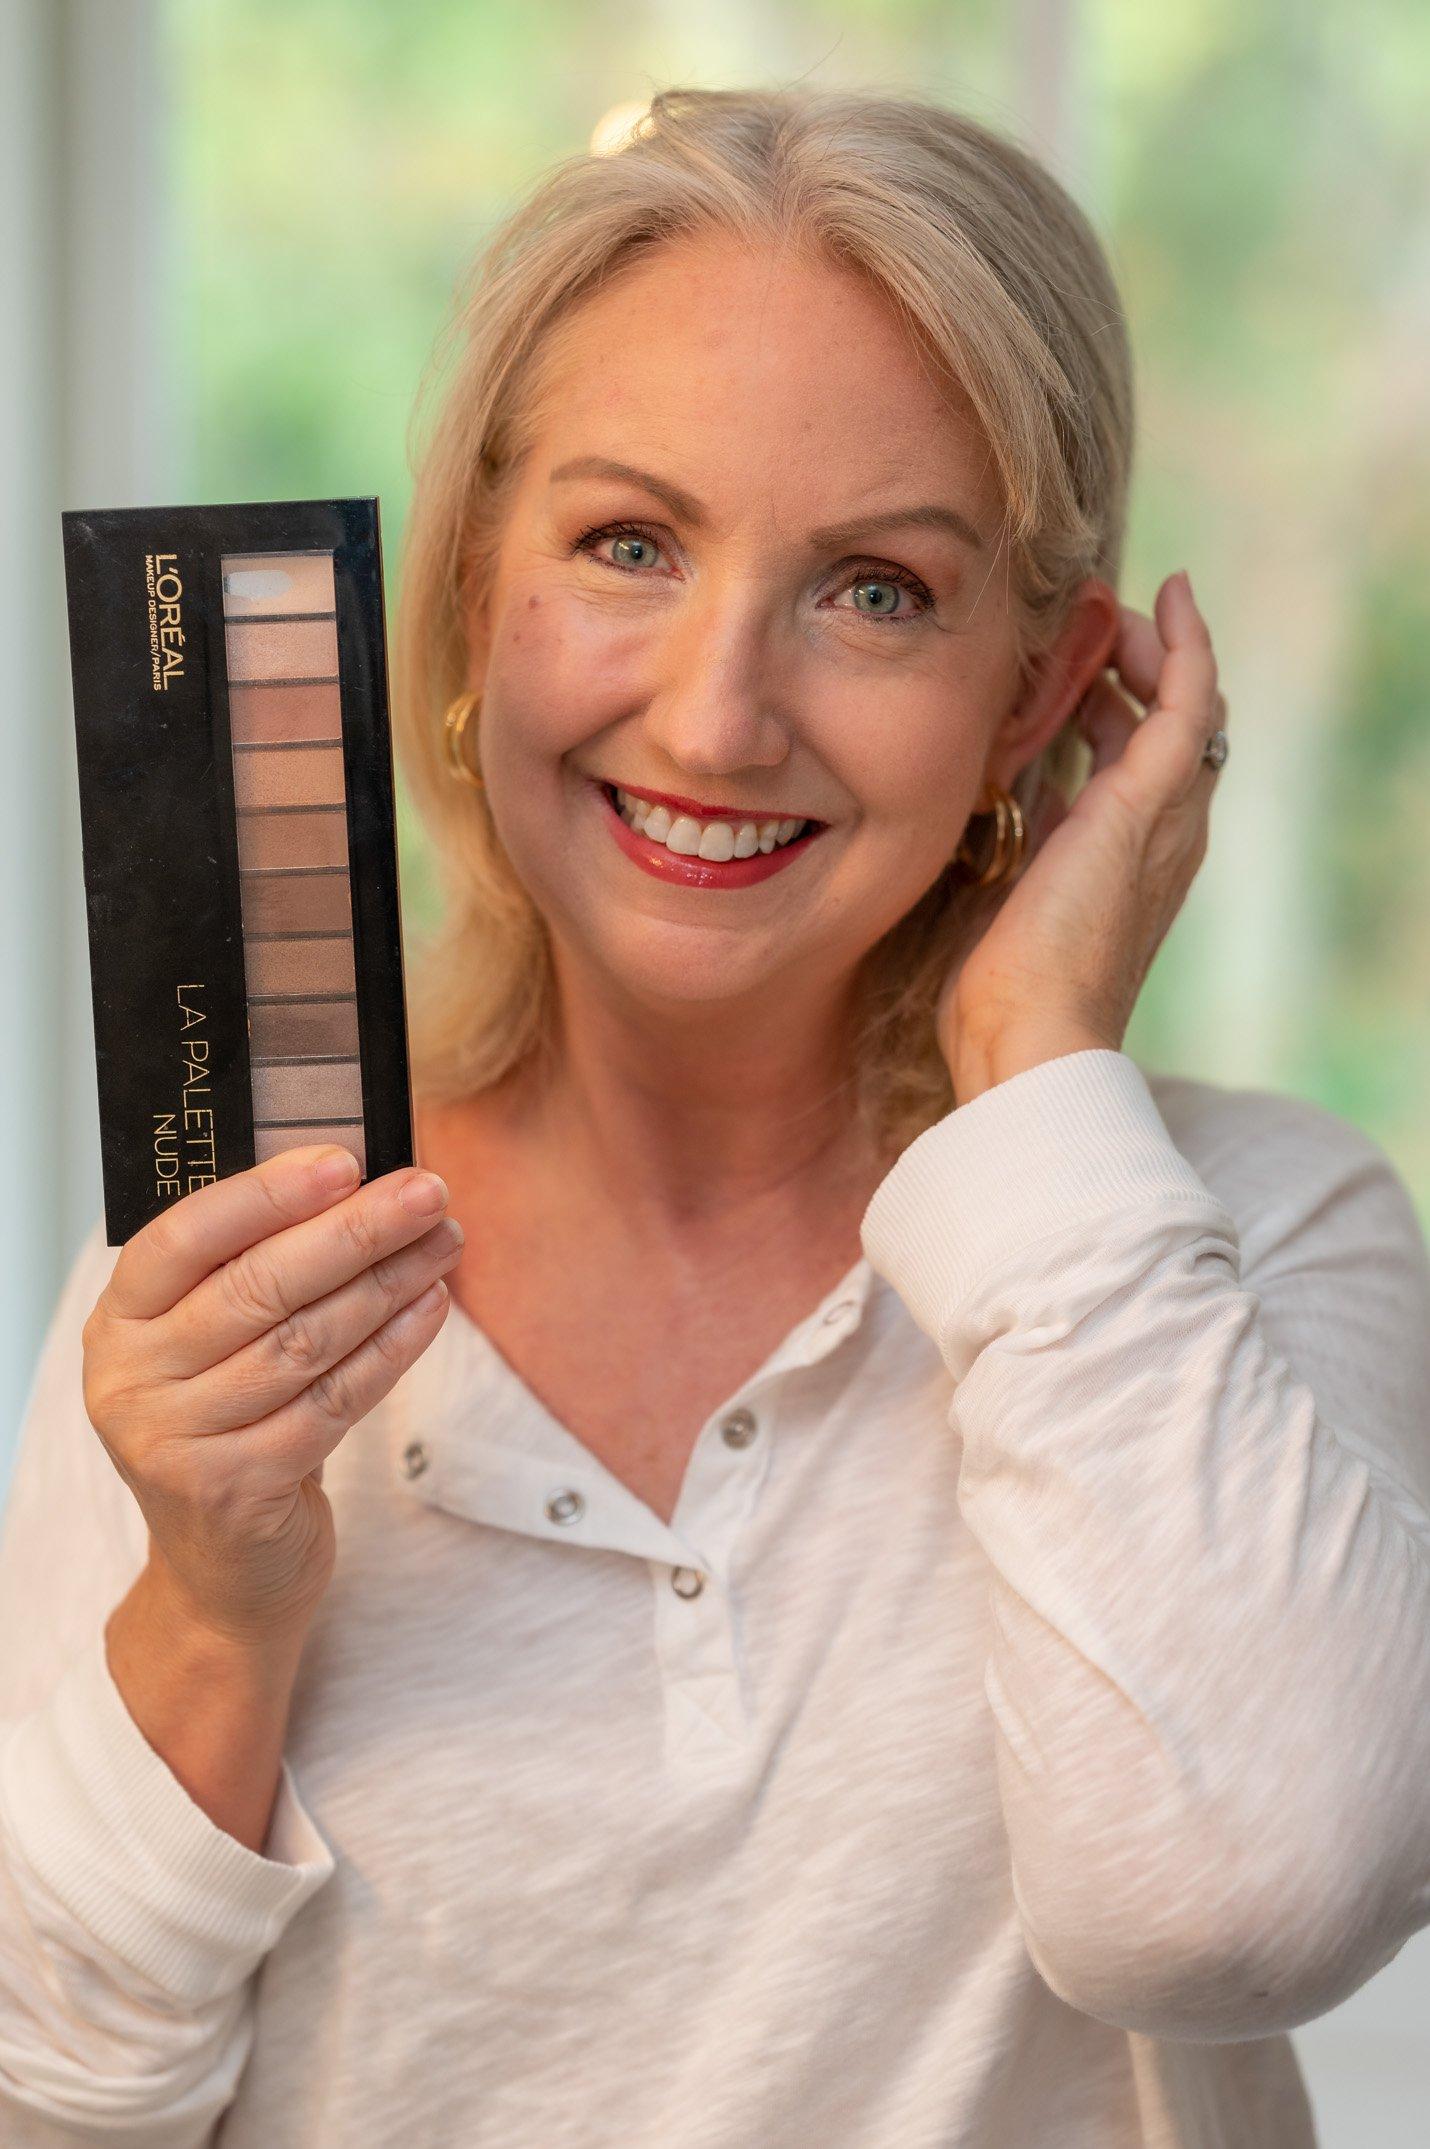 L'Oreal Paris Eyeshadow Palette